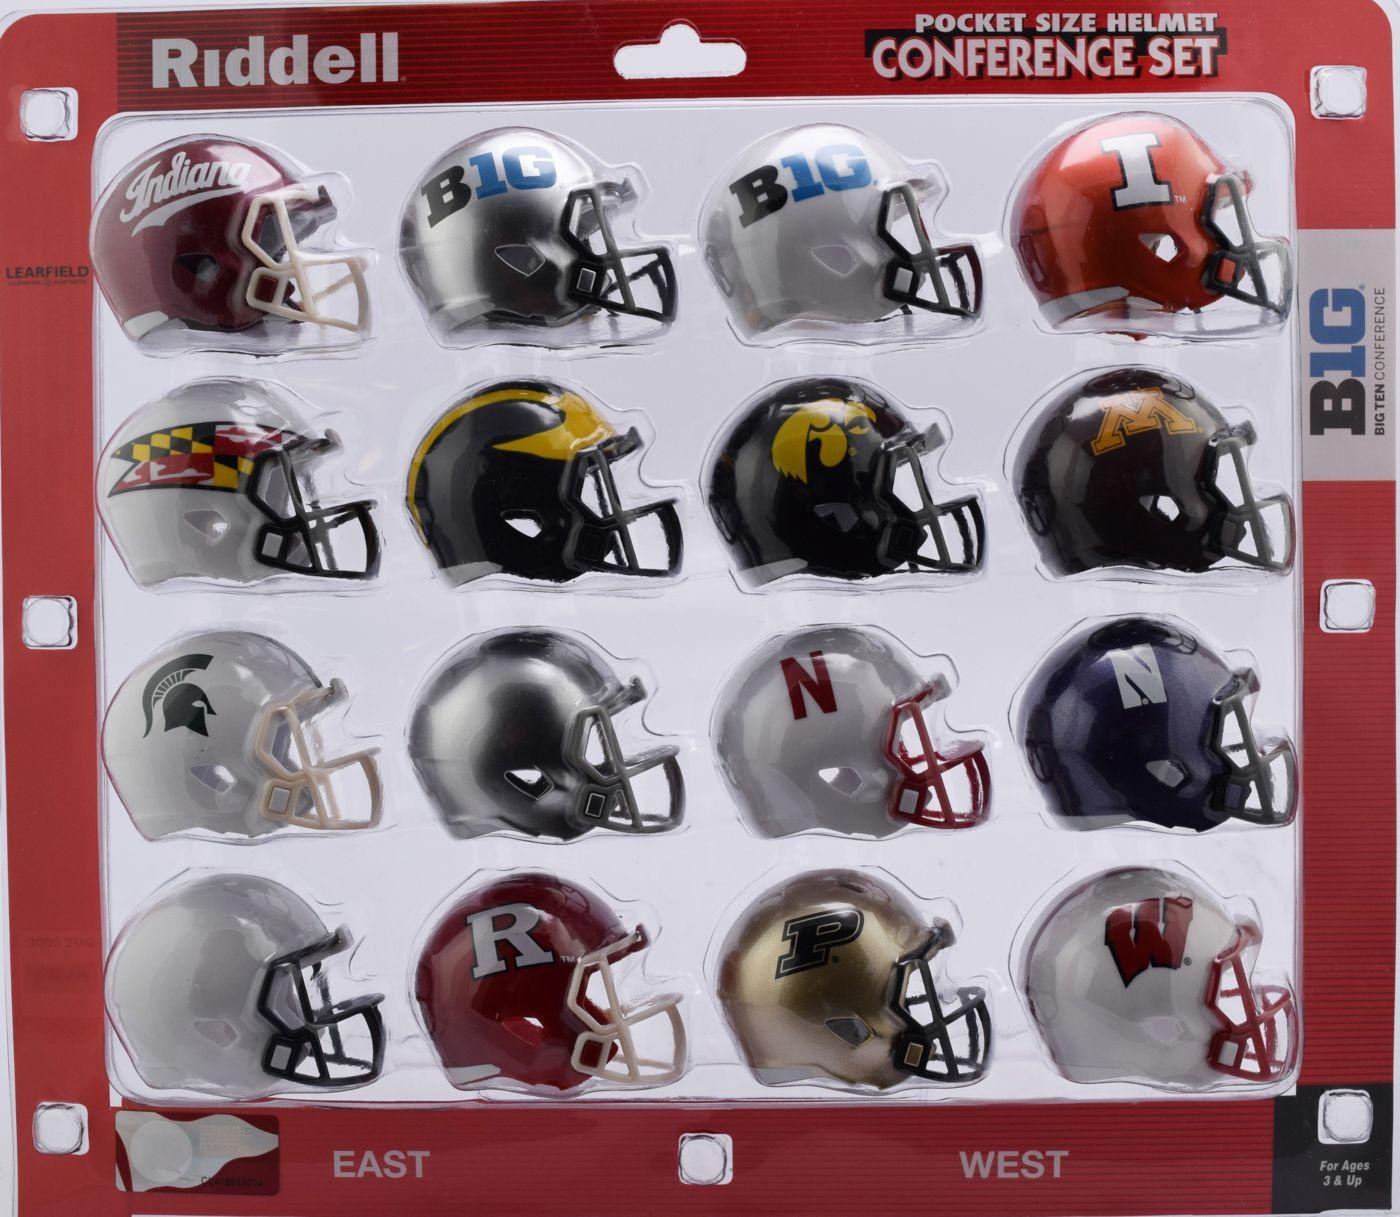 Riddell NCAA Big 10 Pocket Size Helmet Set